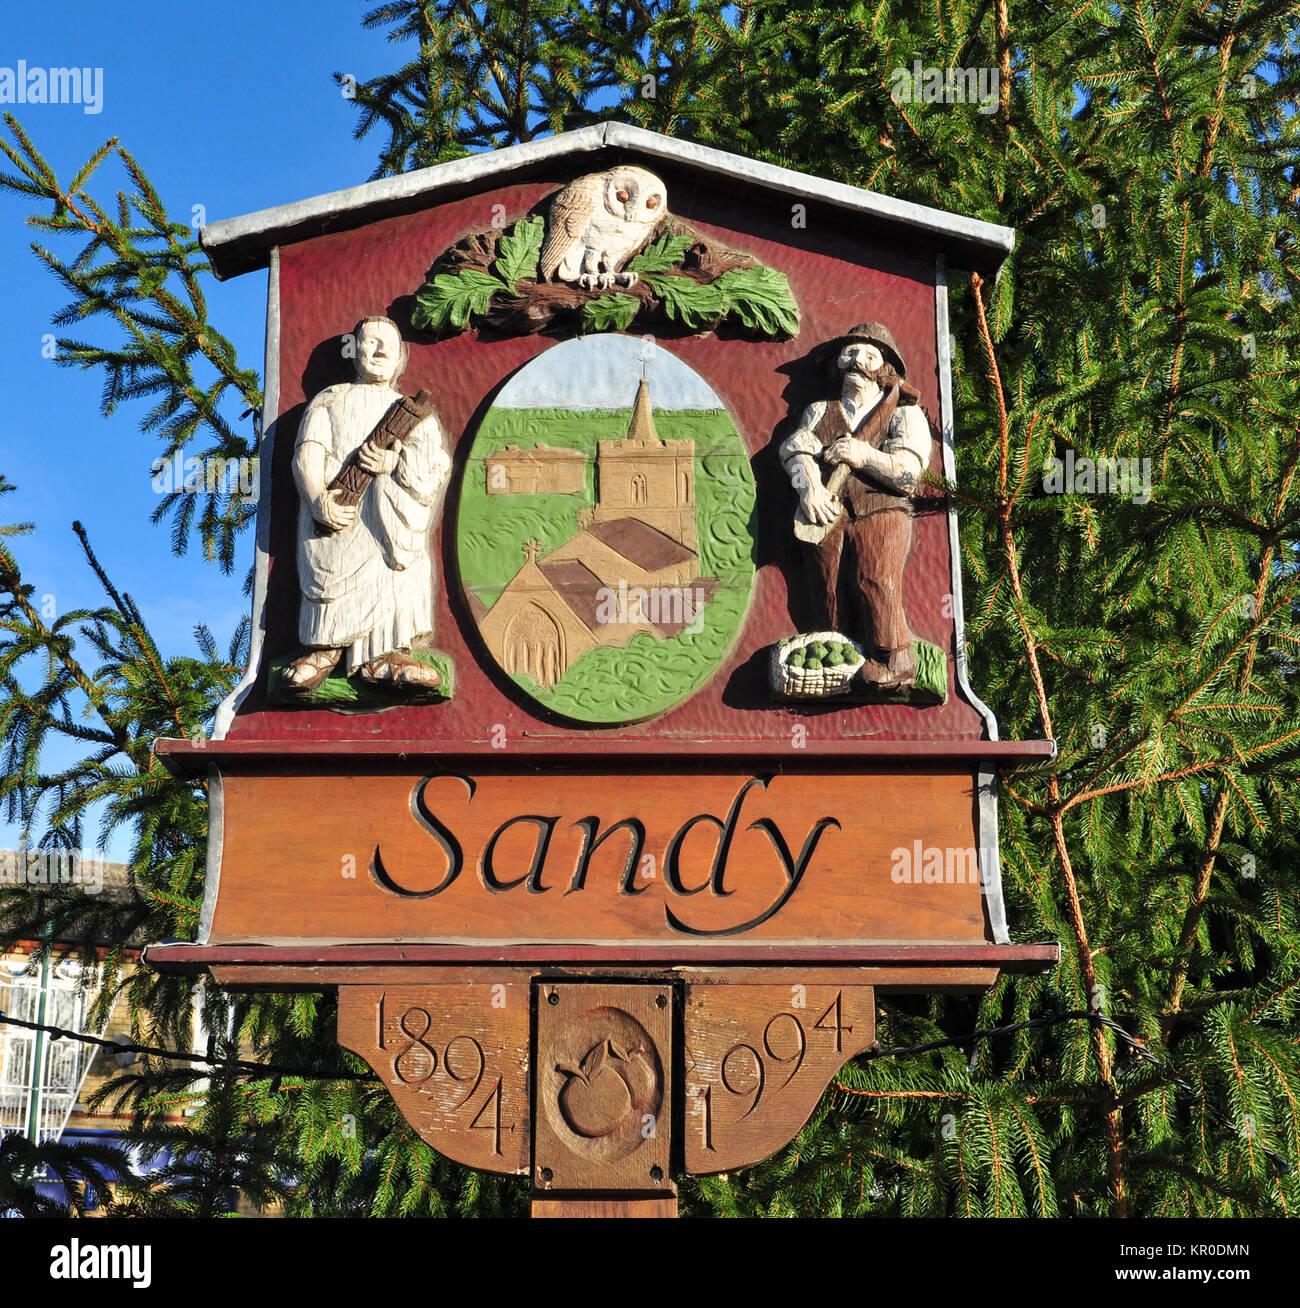 Town sign and emblem, Sandy, Bedfordshire, England, UK - Stock Image